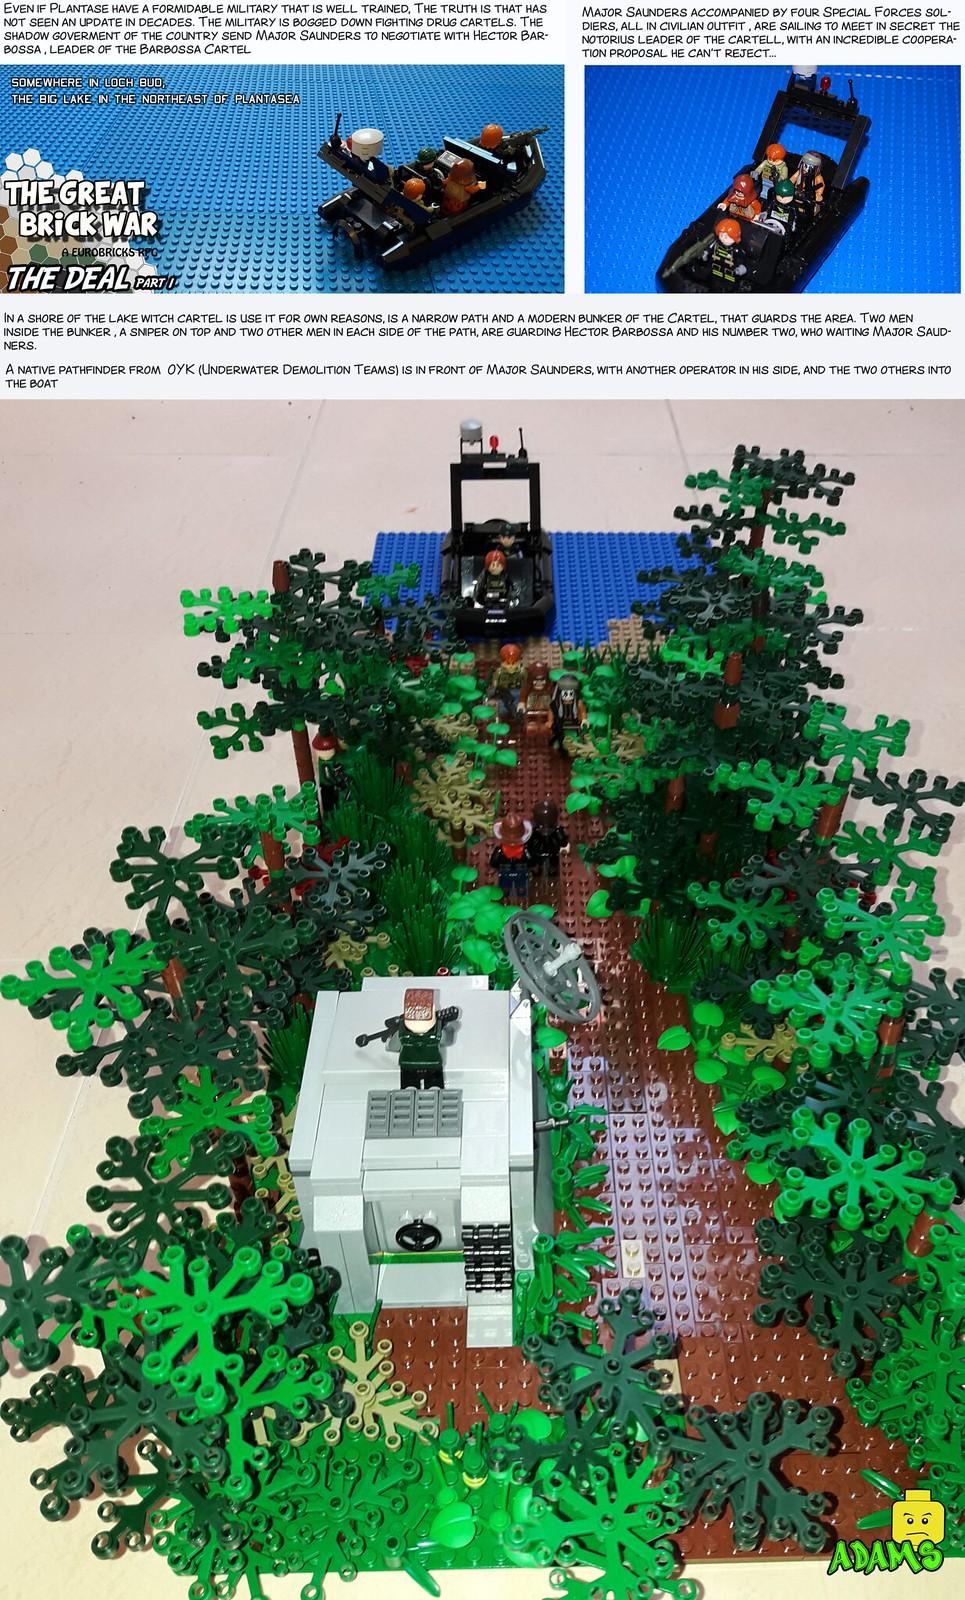 [Great Brick War] - THE DEAL 32971189274_8fc9717f78_h